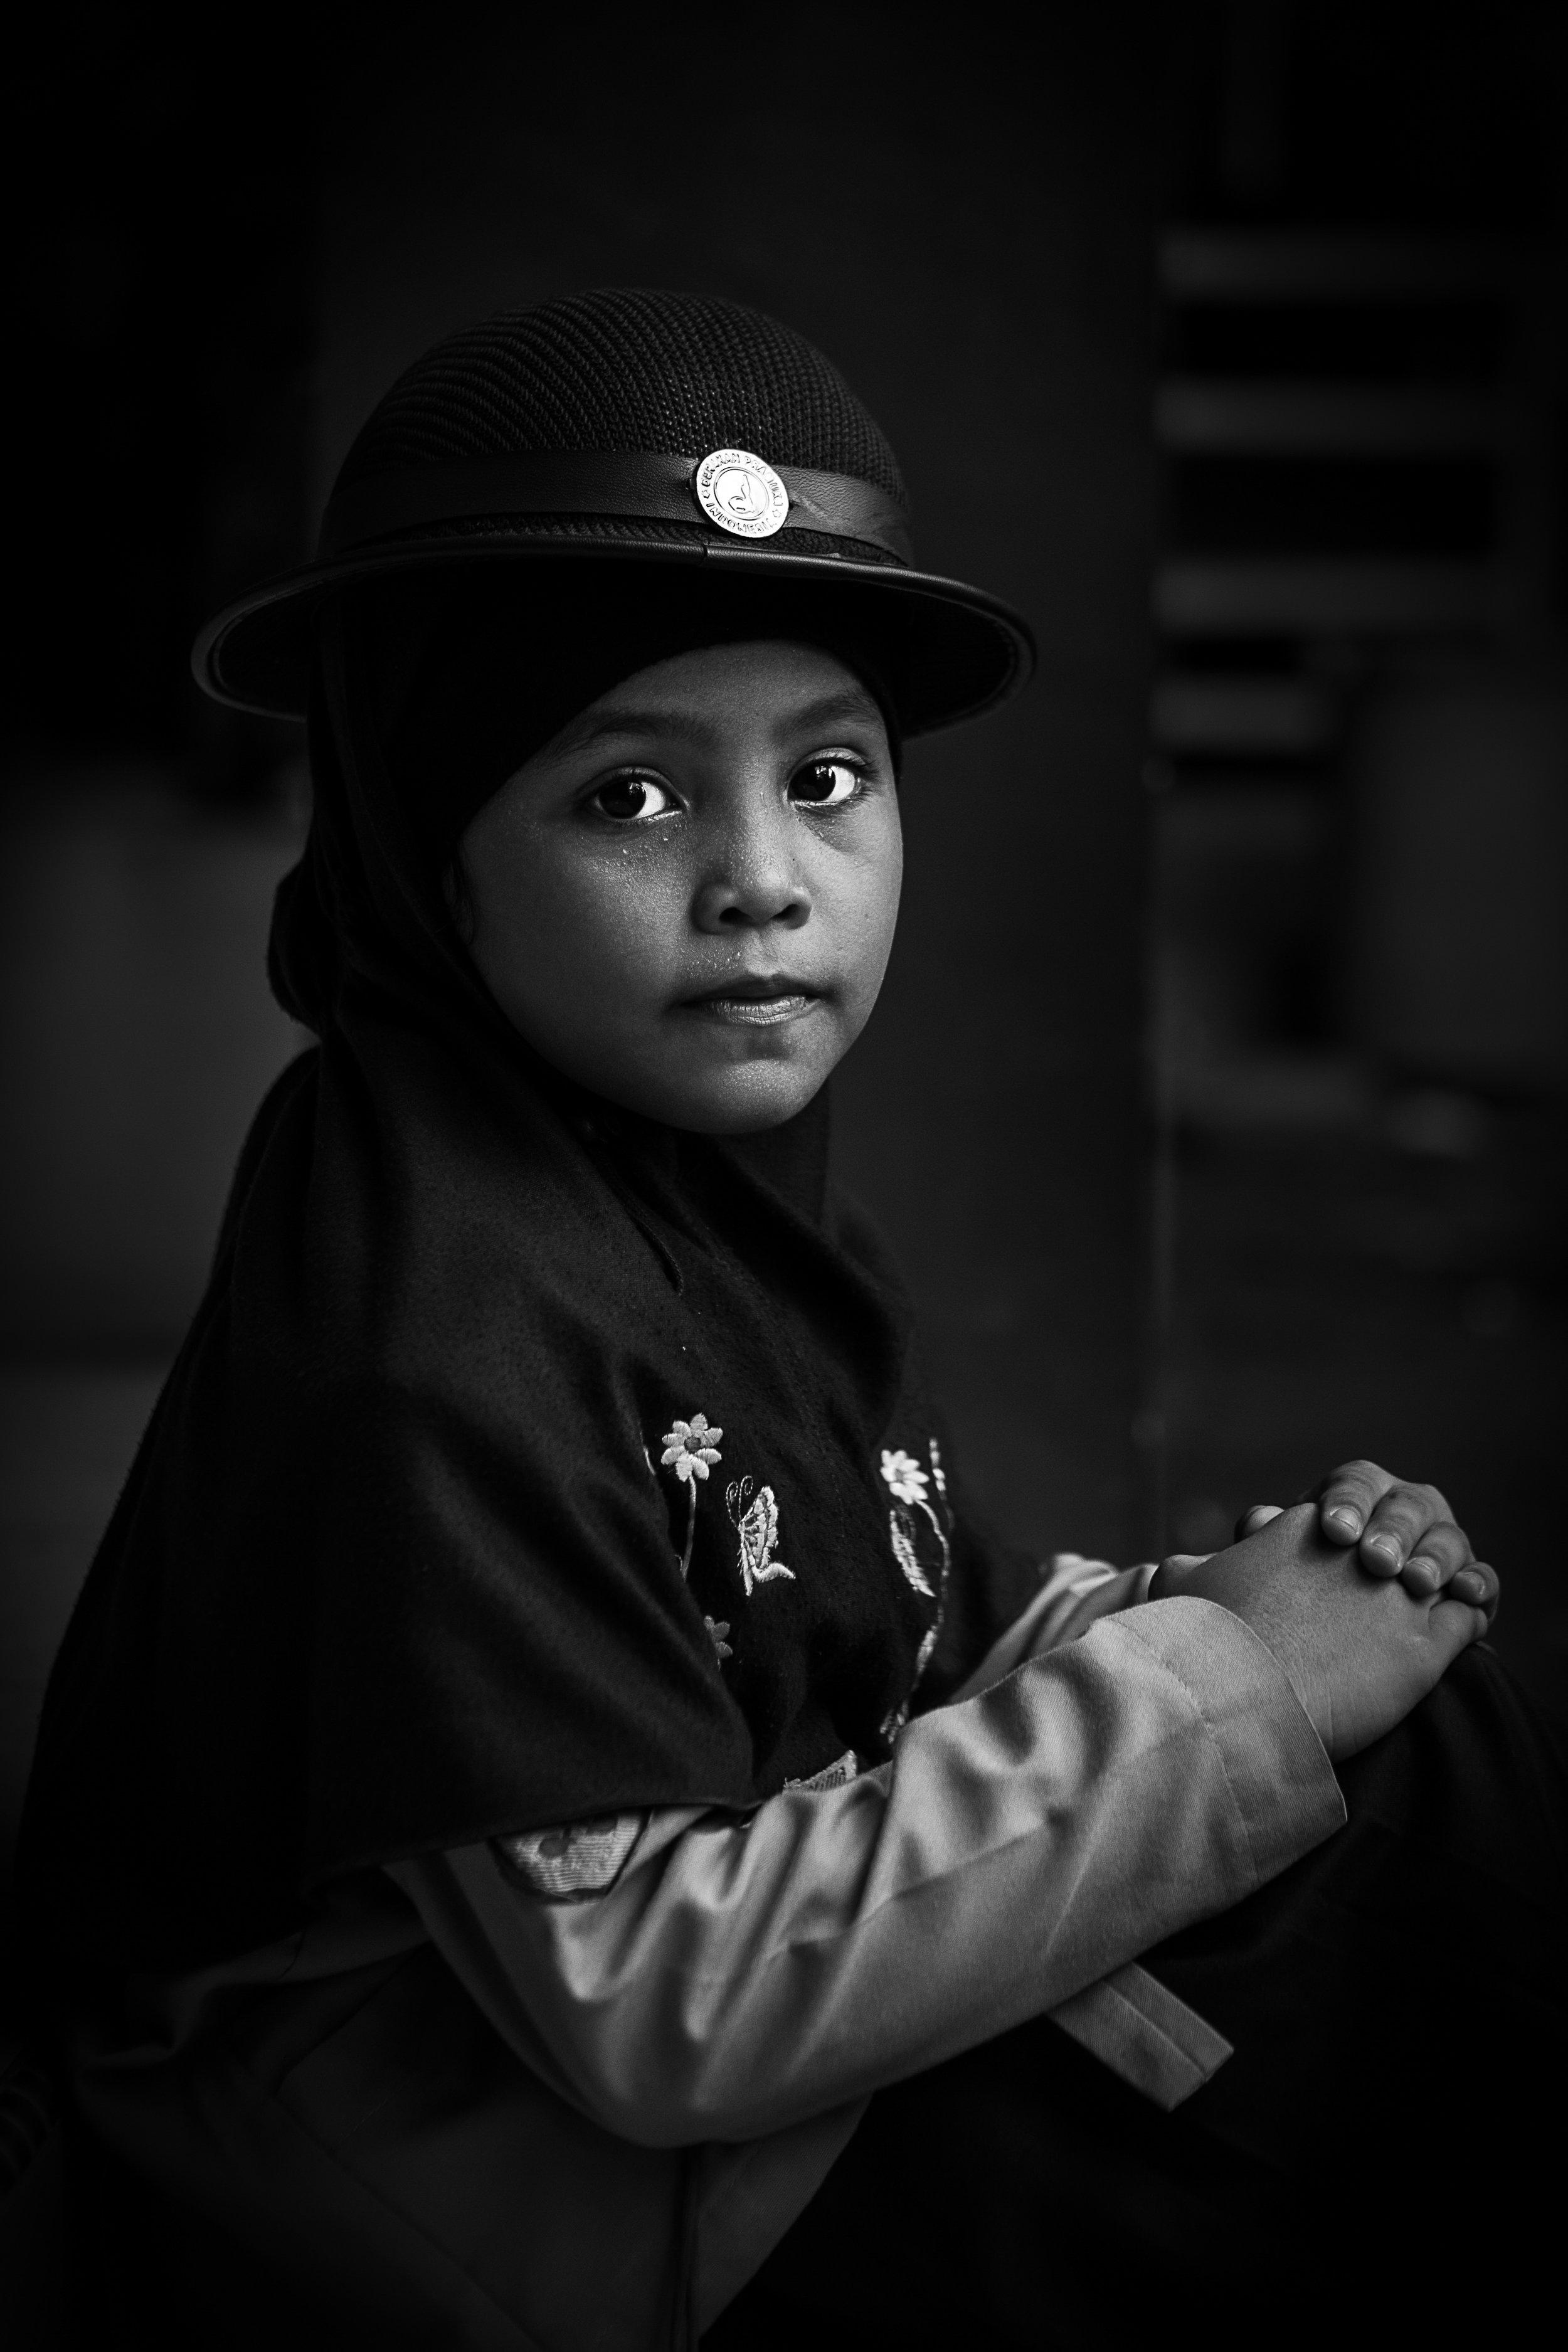 Islamic female student at an Islamic School in Medan, Indonesia.